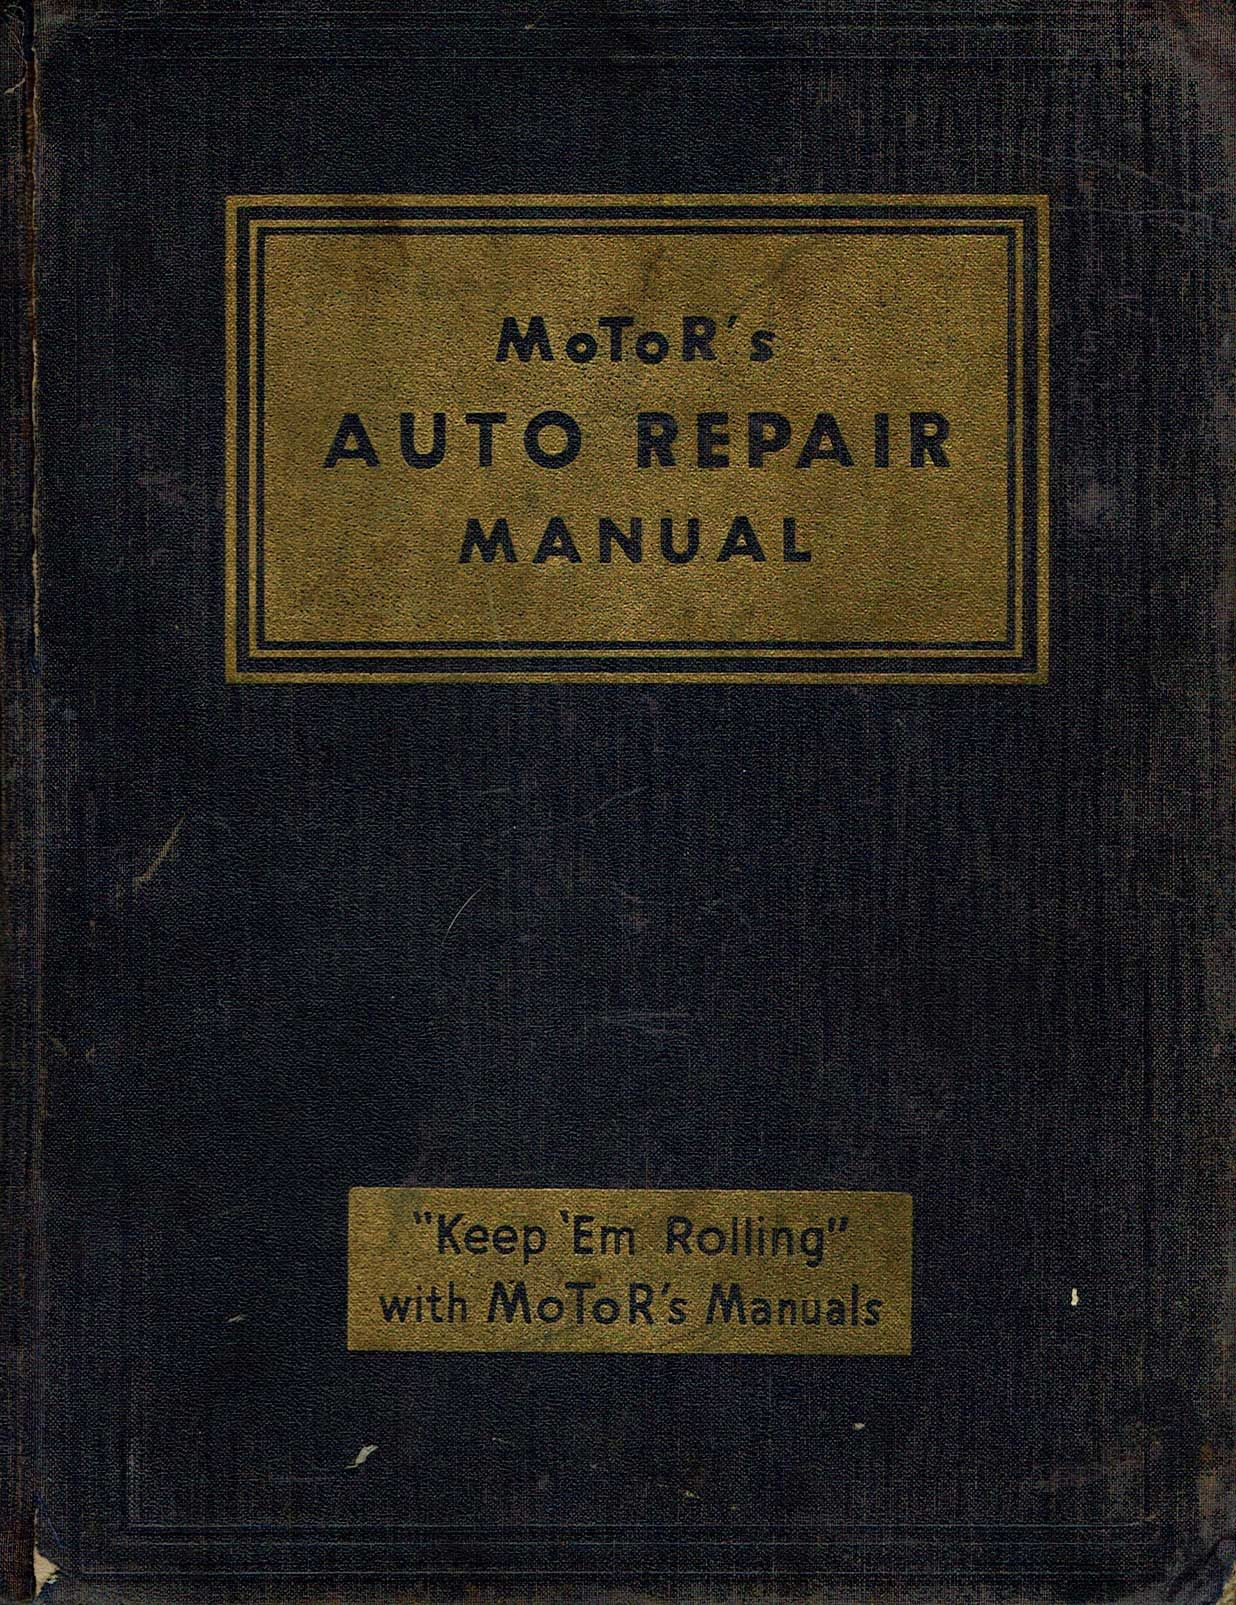 Motors Auto Repair Manual Thirteenth Edition 1950 By Harold F Blanchard Hardcover 1950